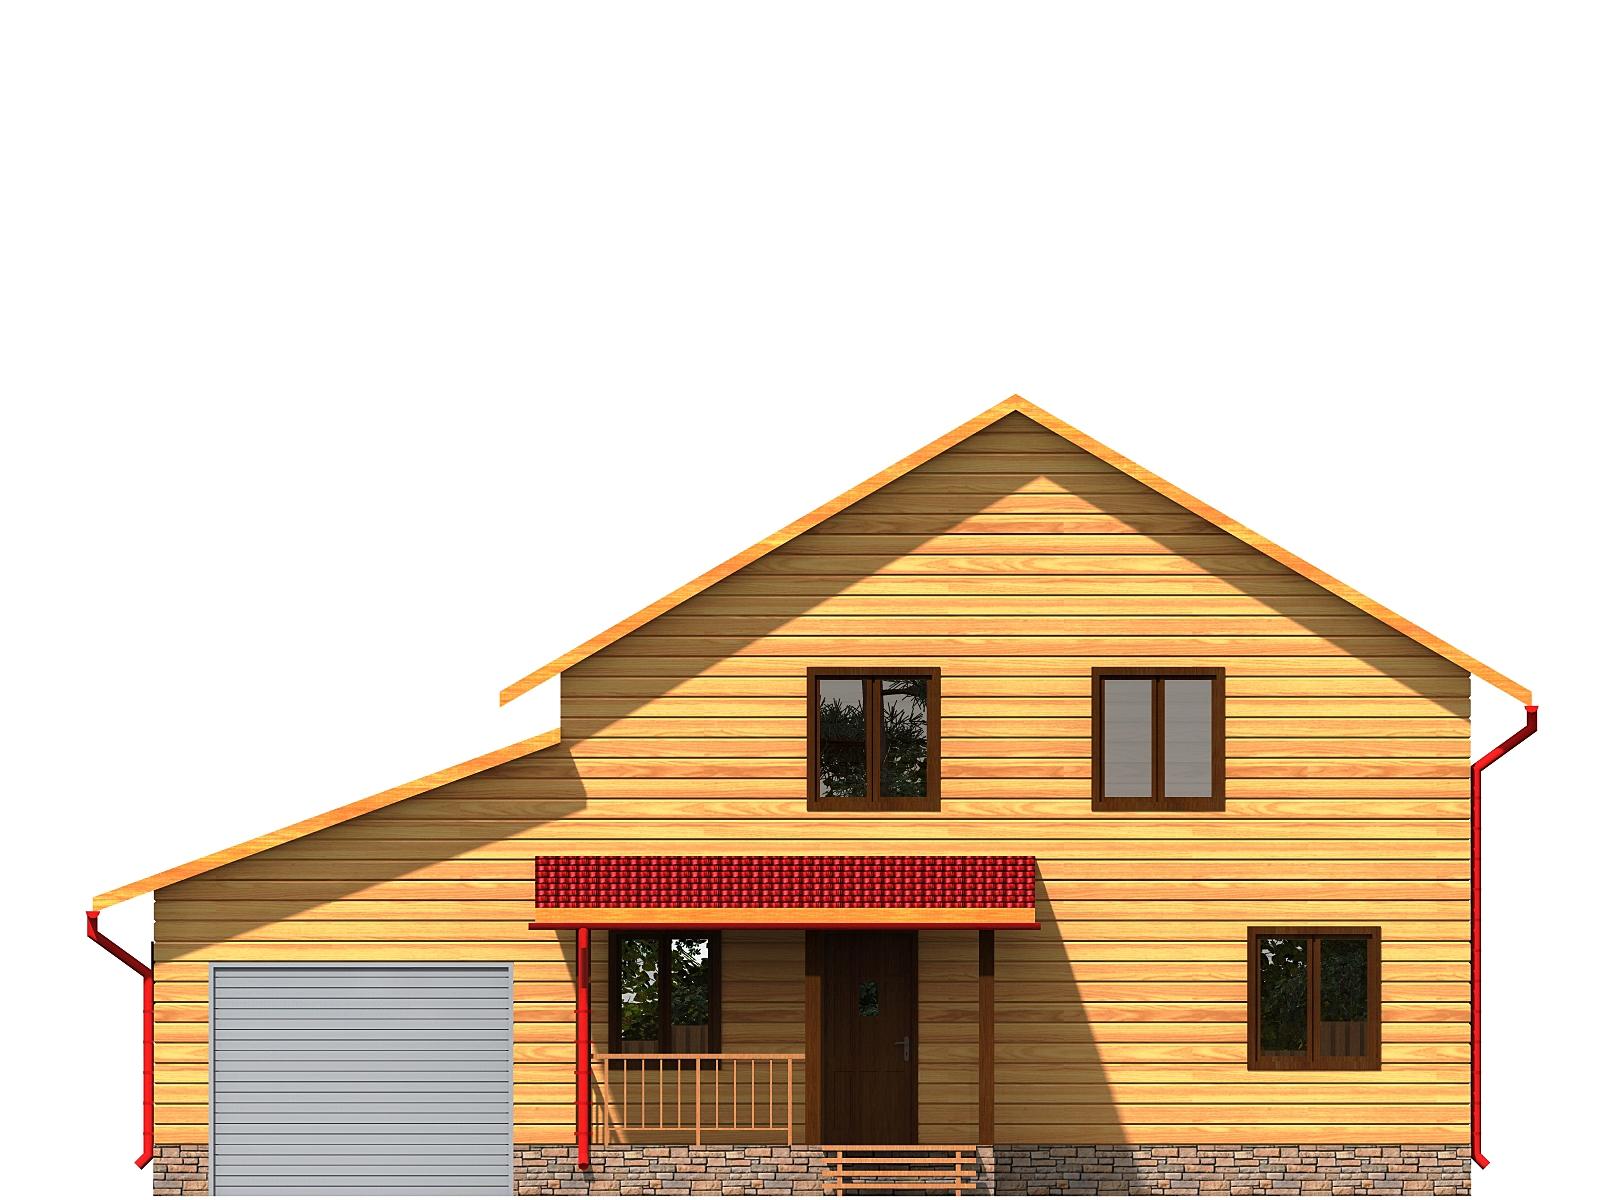 Проект дома из бруса 9,3х12,8 1,5 этажа с гаражом. Разрез 1.